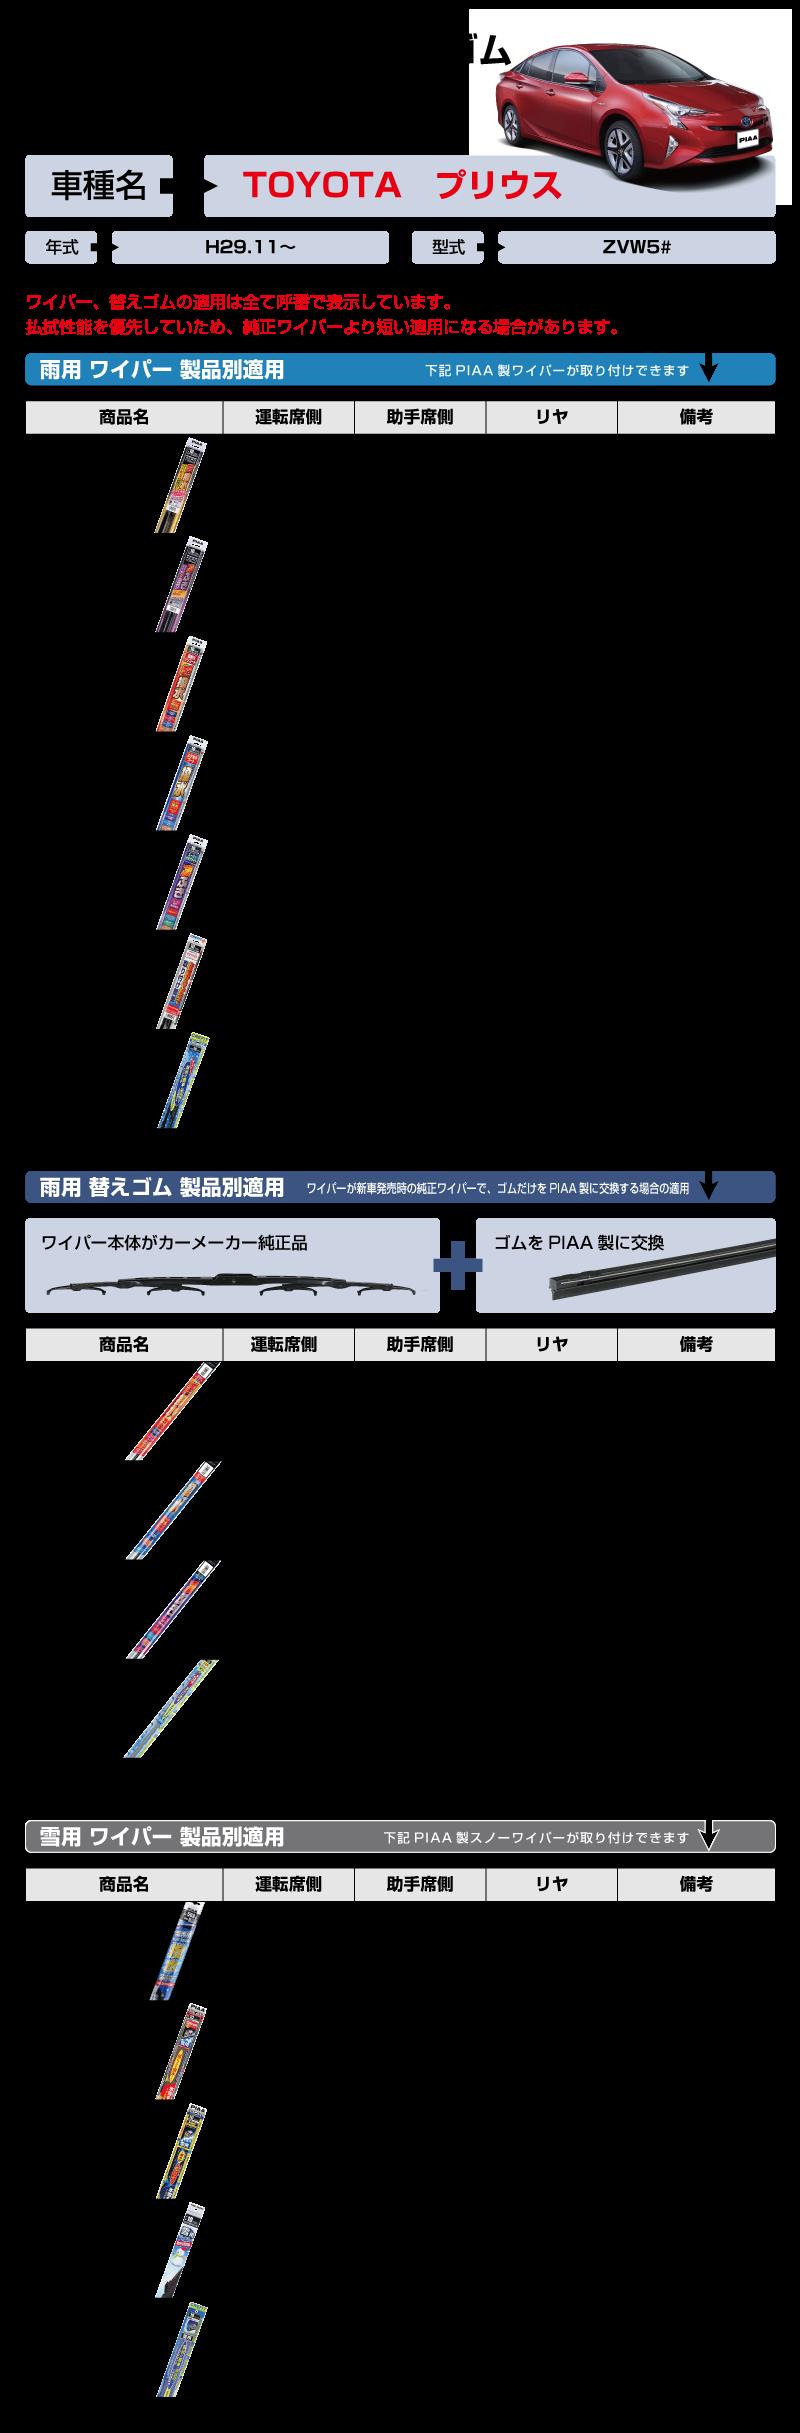 TEKIYO_TOYOTA_PRIUS_H29.11